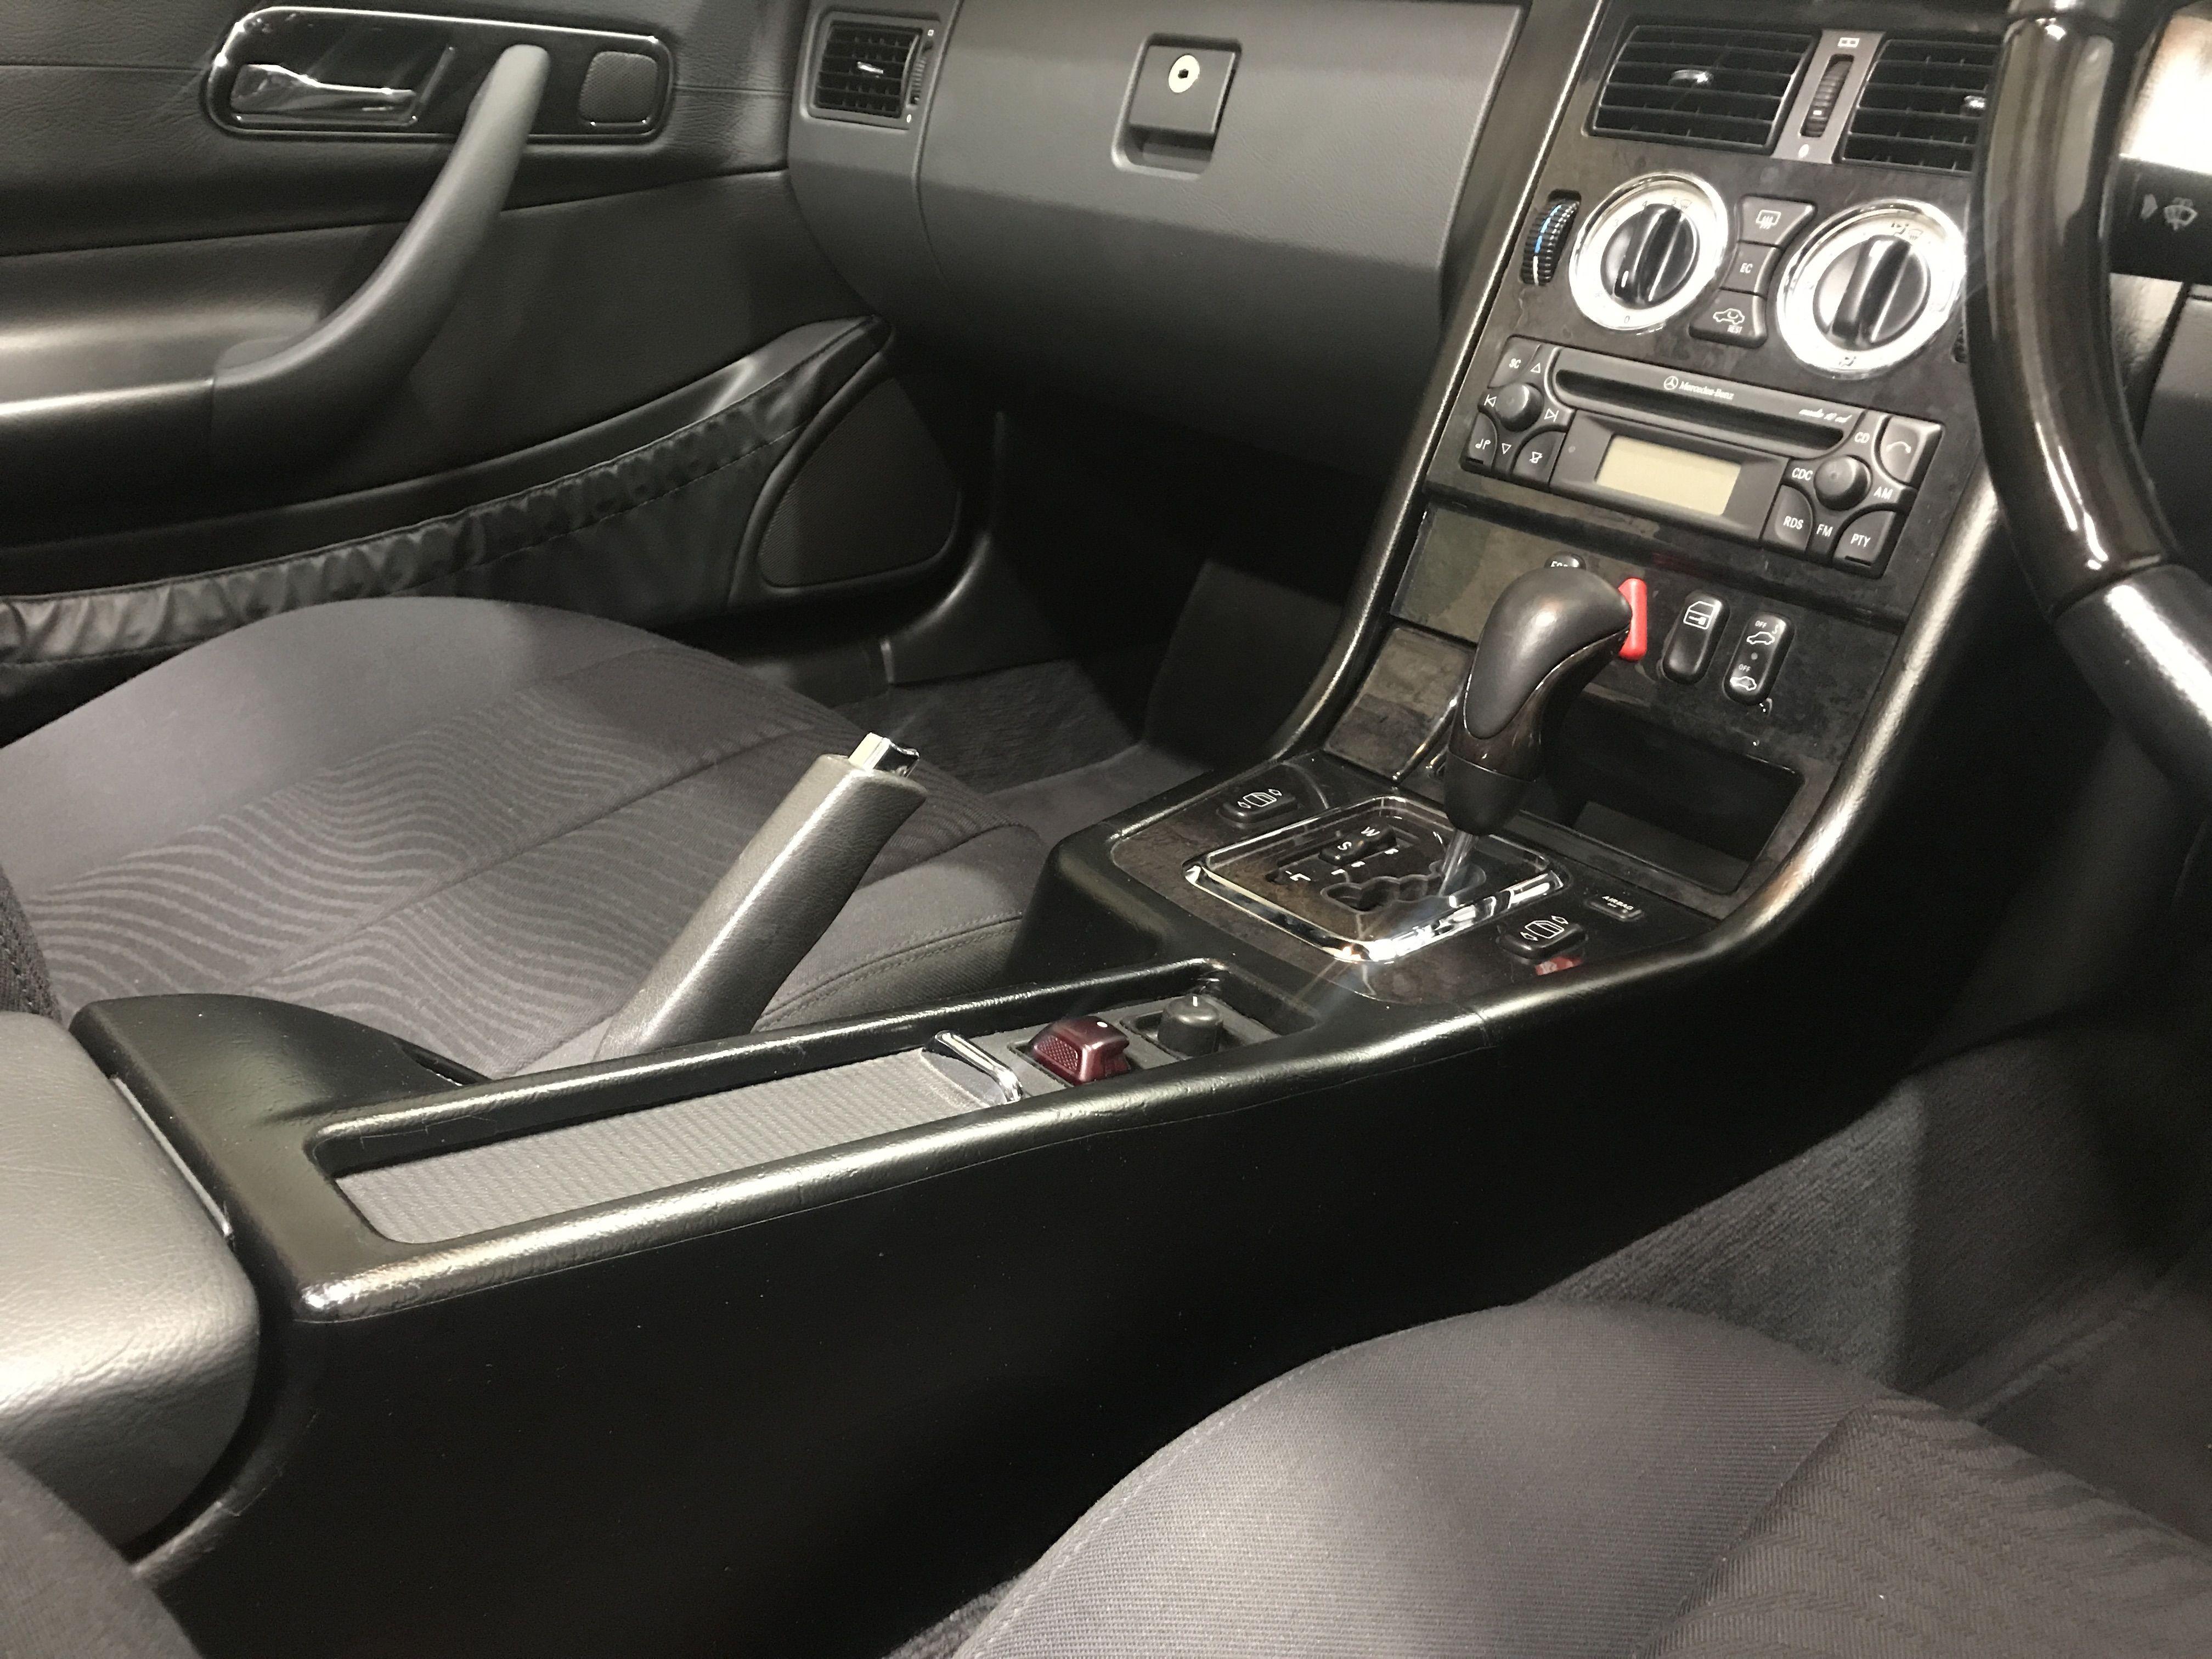 Lamborghini Murcielago Sv Interior Https Www Wraptition Co Uk